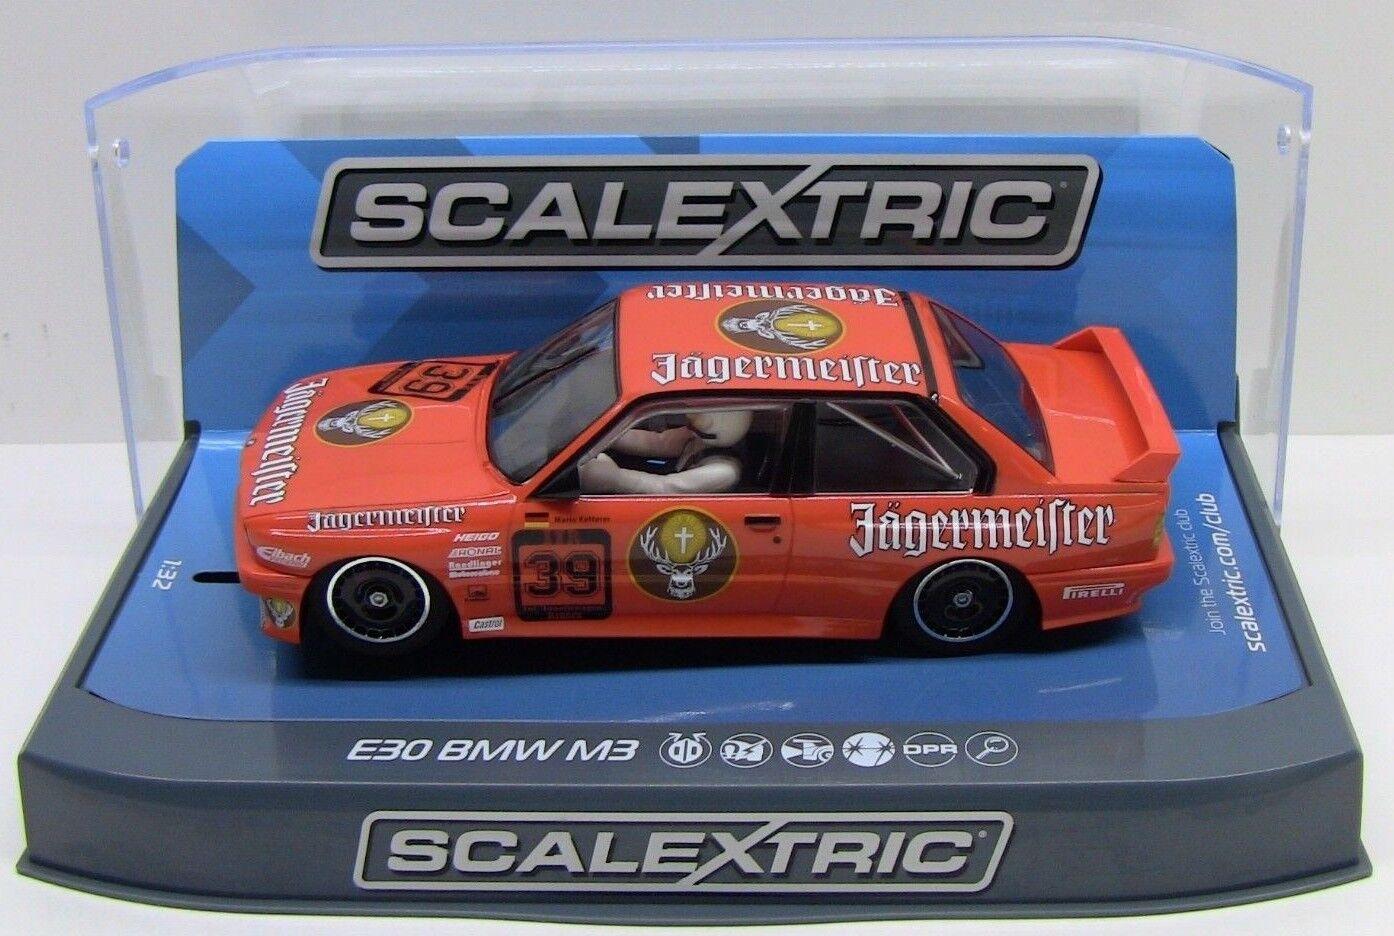 Scalextric 1 32 BMW M3 E30 - NURBURGRING 1988 Slot Car C3899